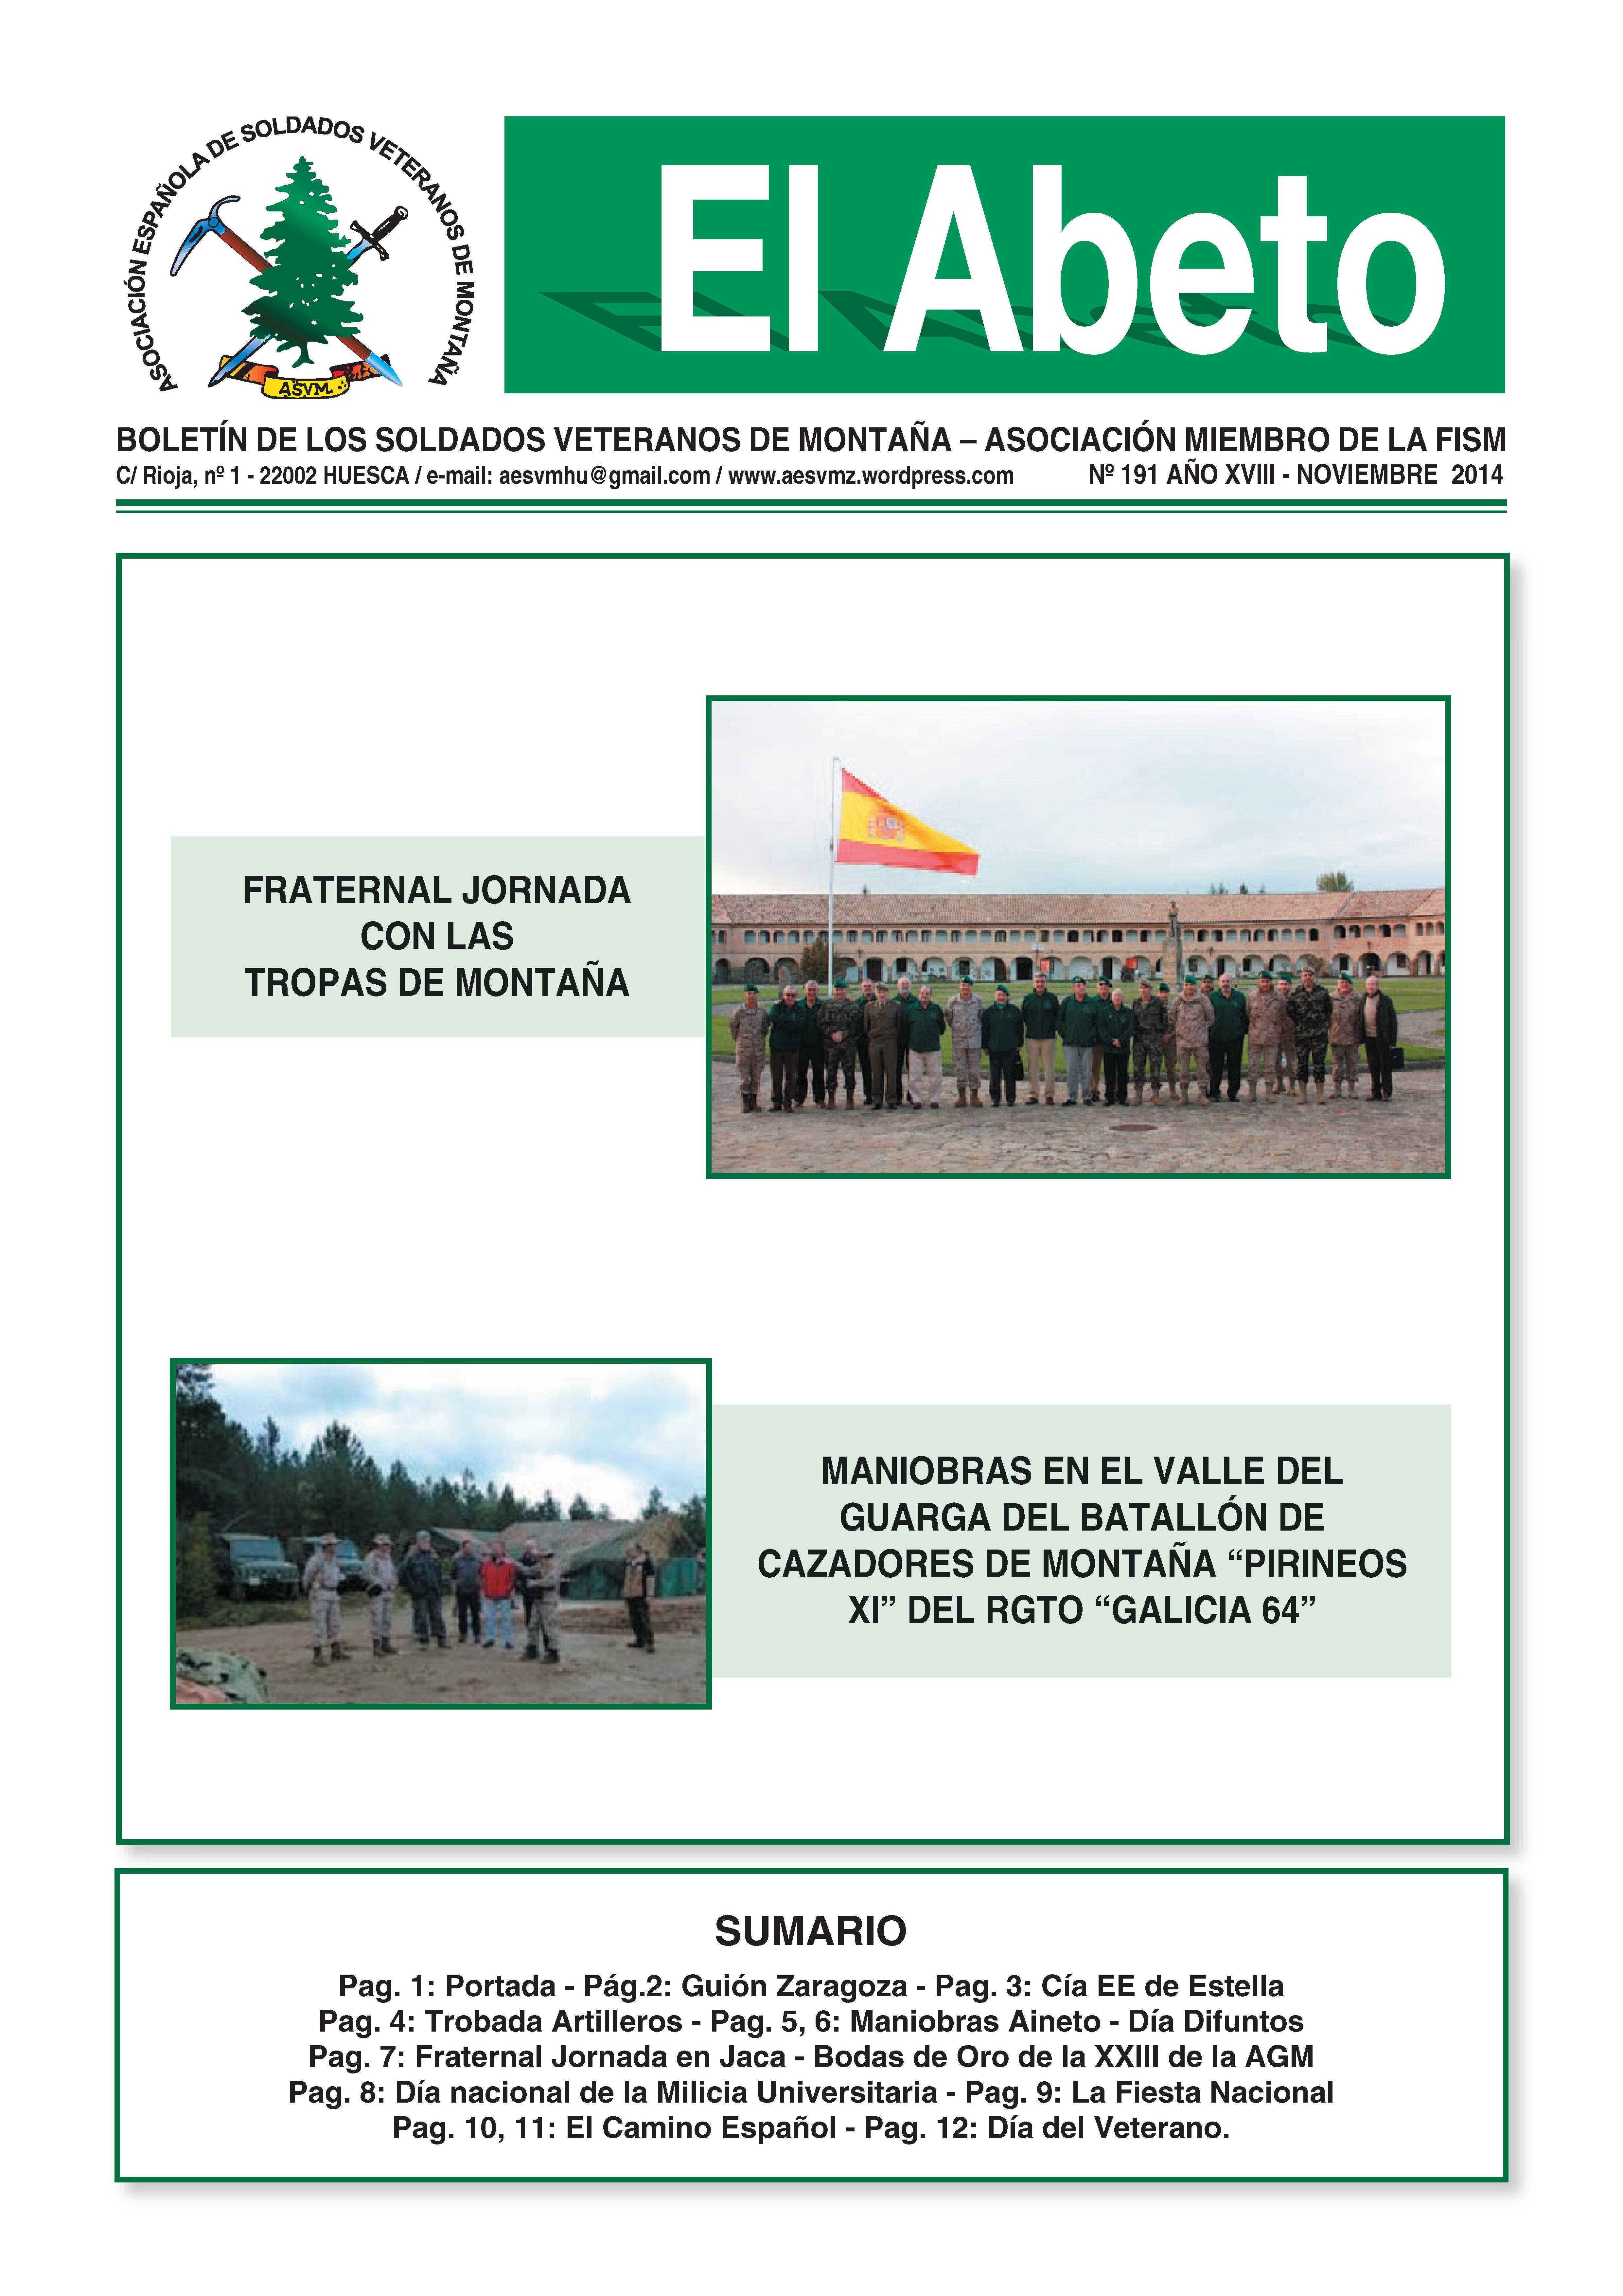 REvista digital EL ABETO núm. 191